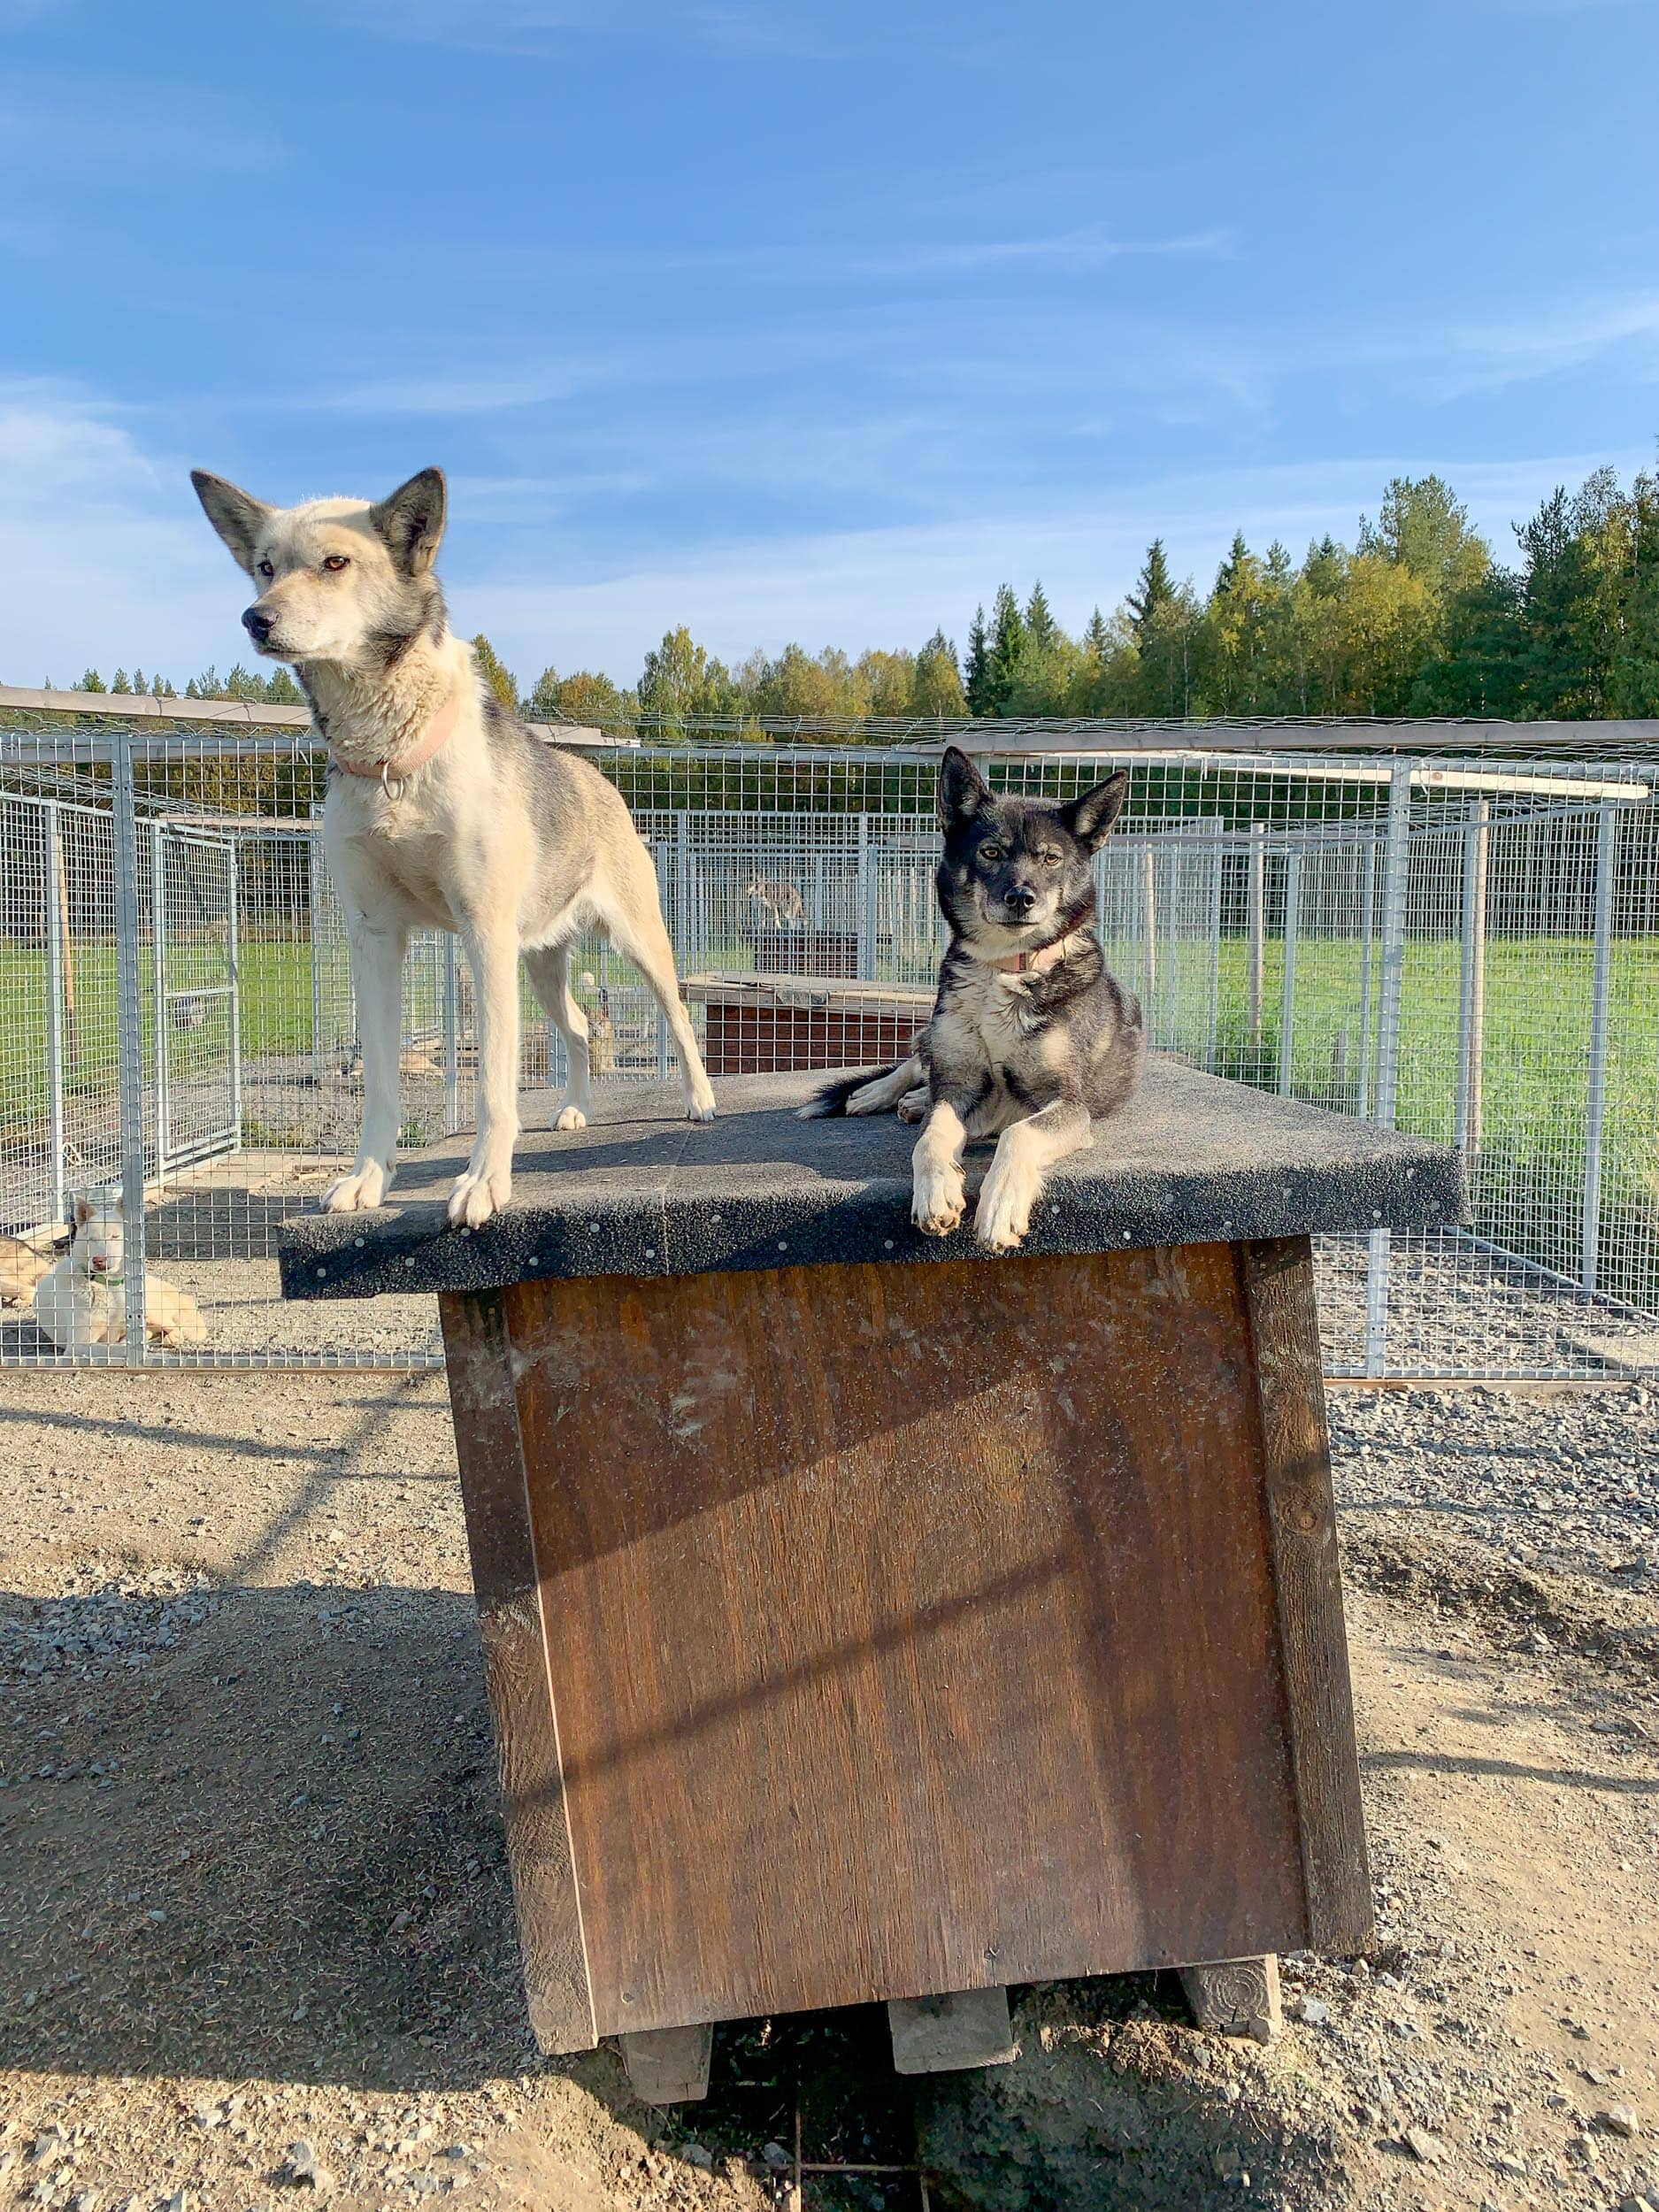 Huskies at Spruce Island Husky in Vasterbotten, Sweden